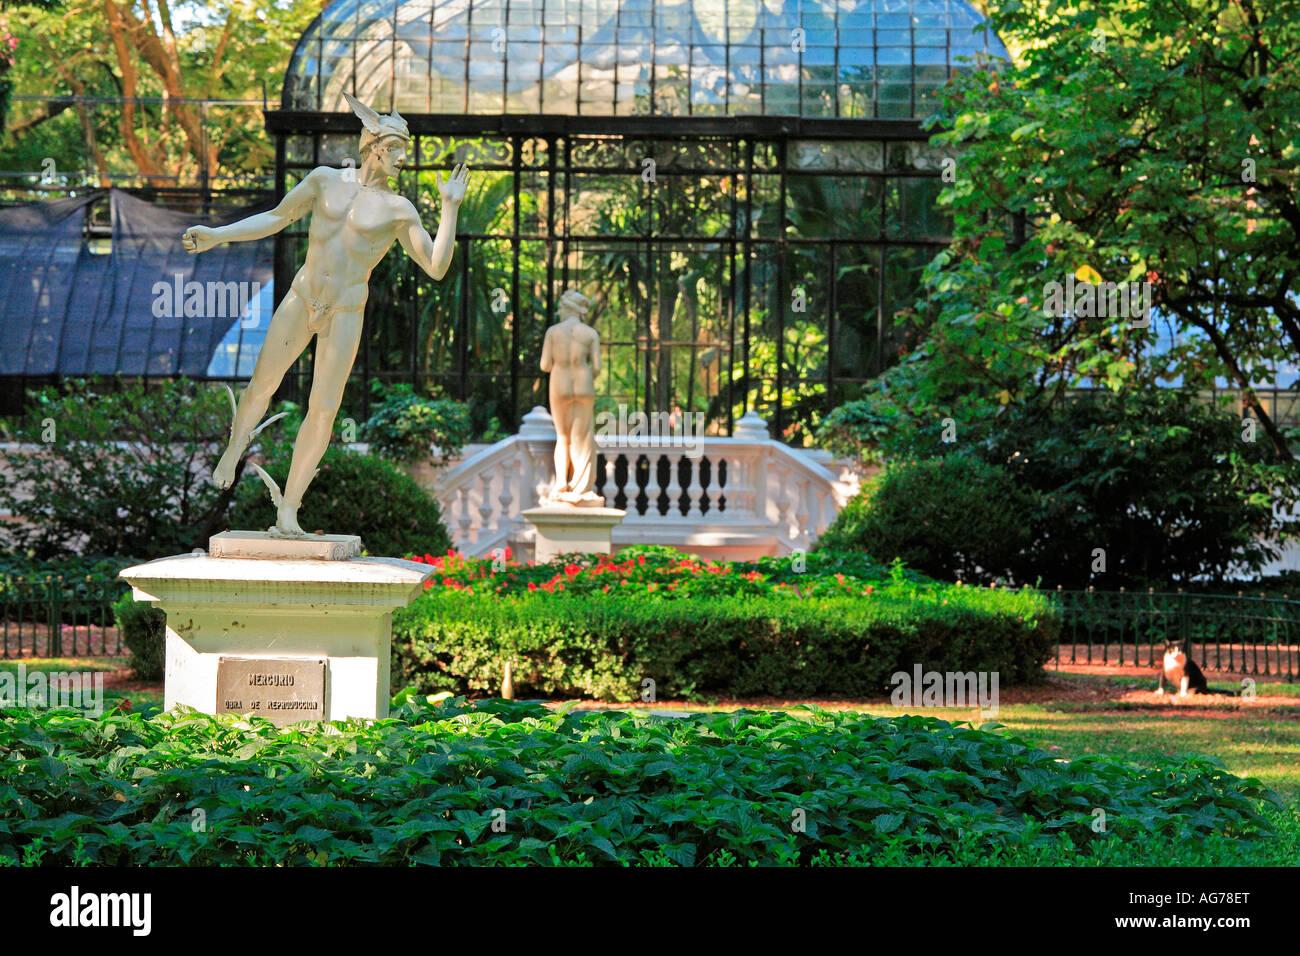 Jardin bot nico carlos thays charles thay botanical garden for Amapola jardin de infantes palermo